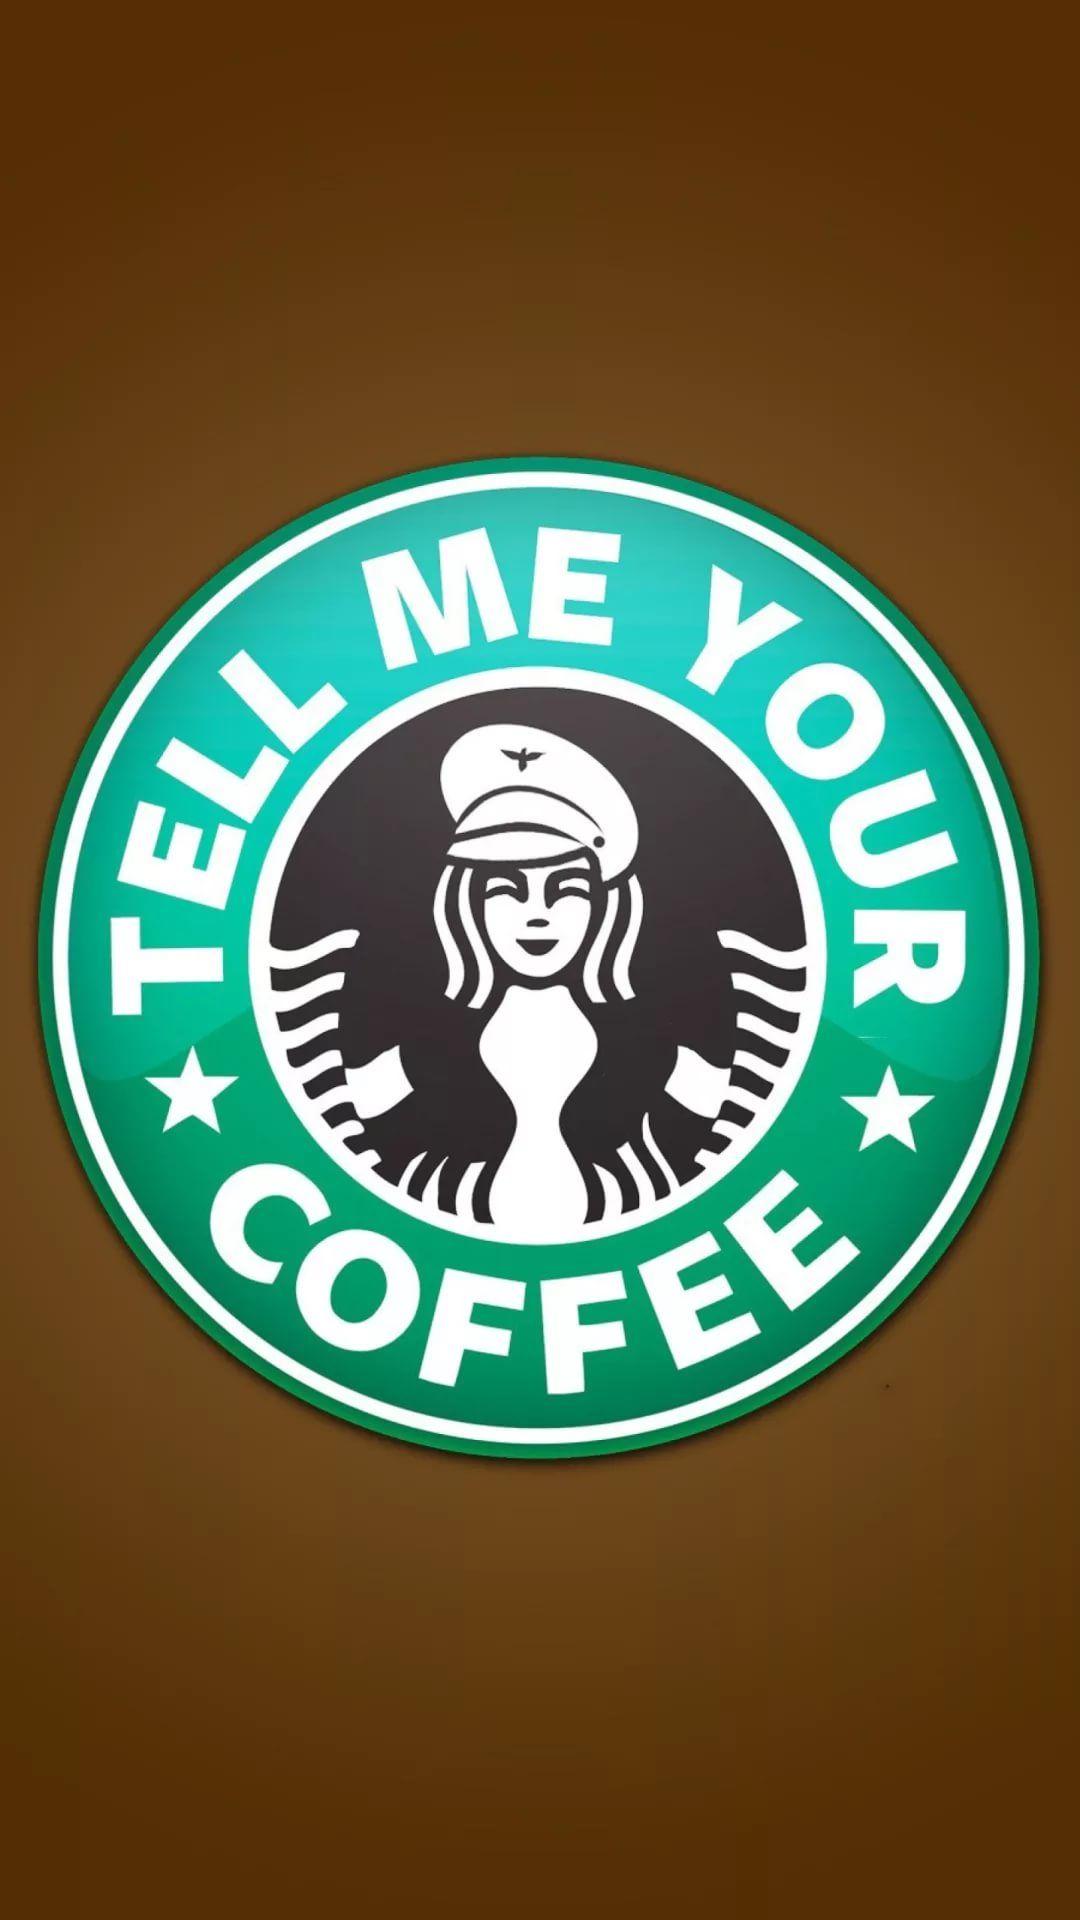 Starbucks iOS 7 wallpaper